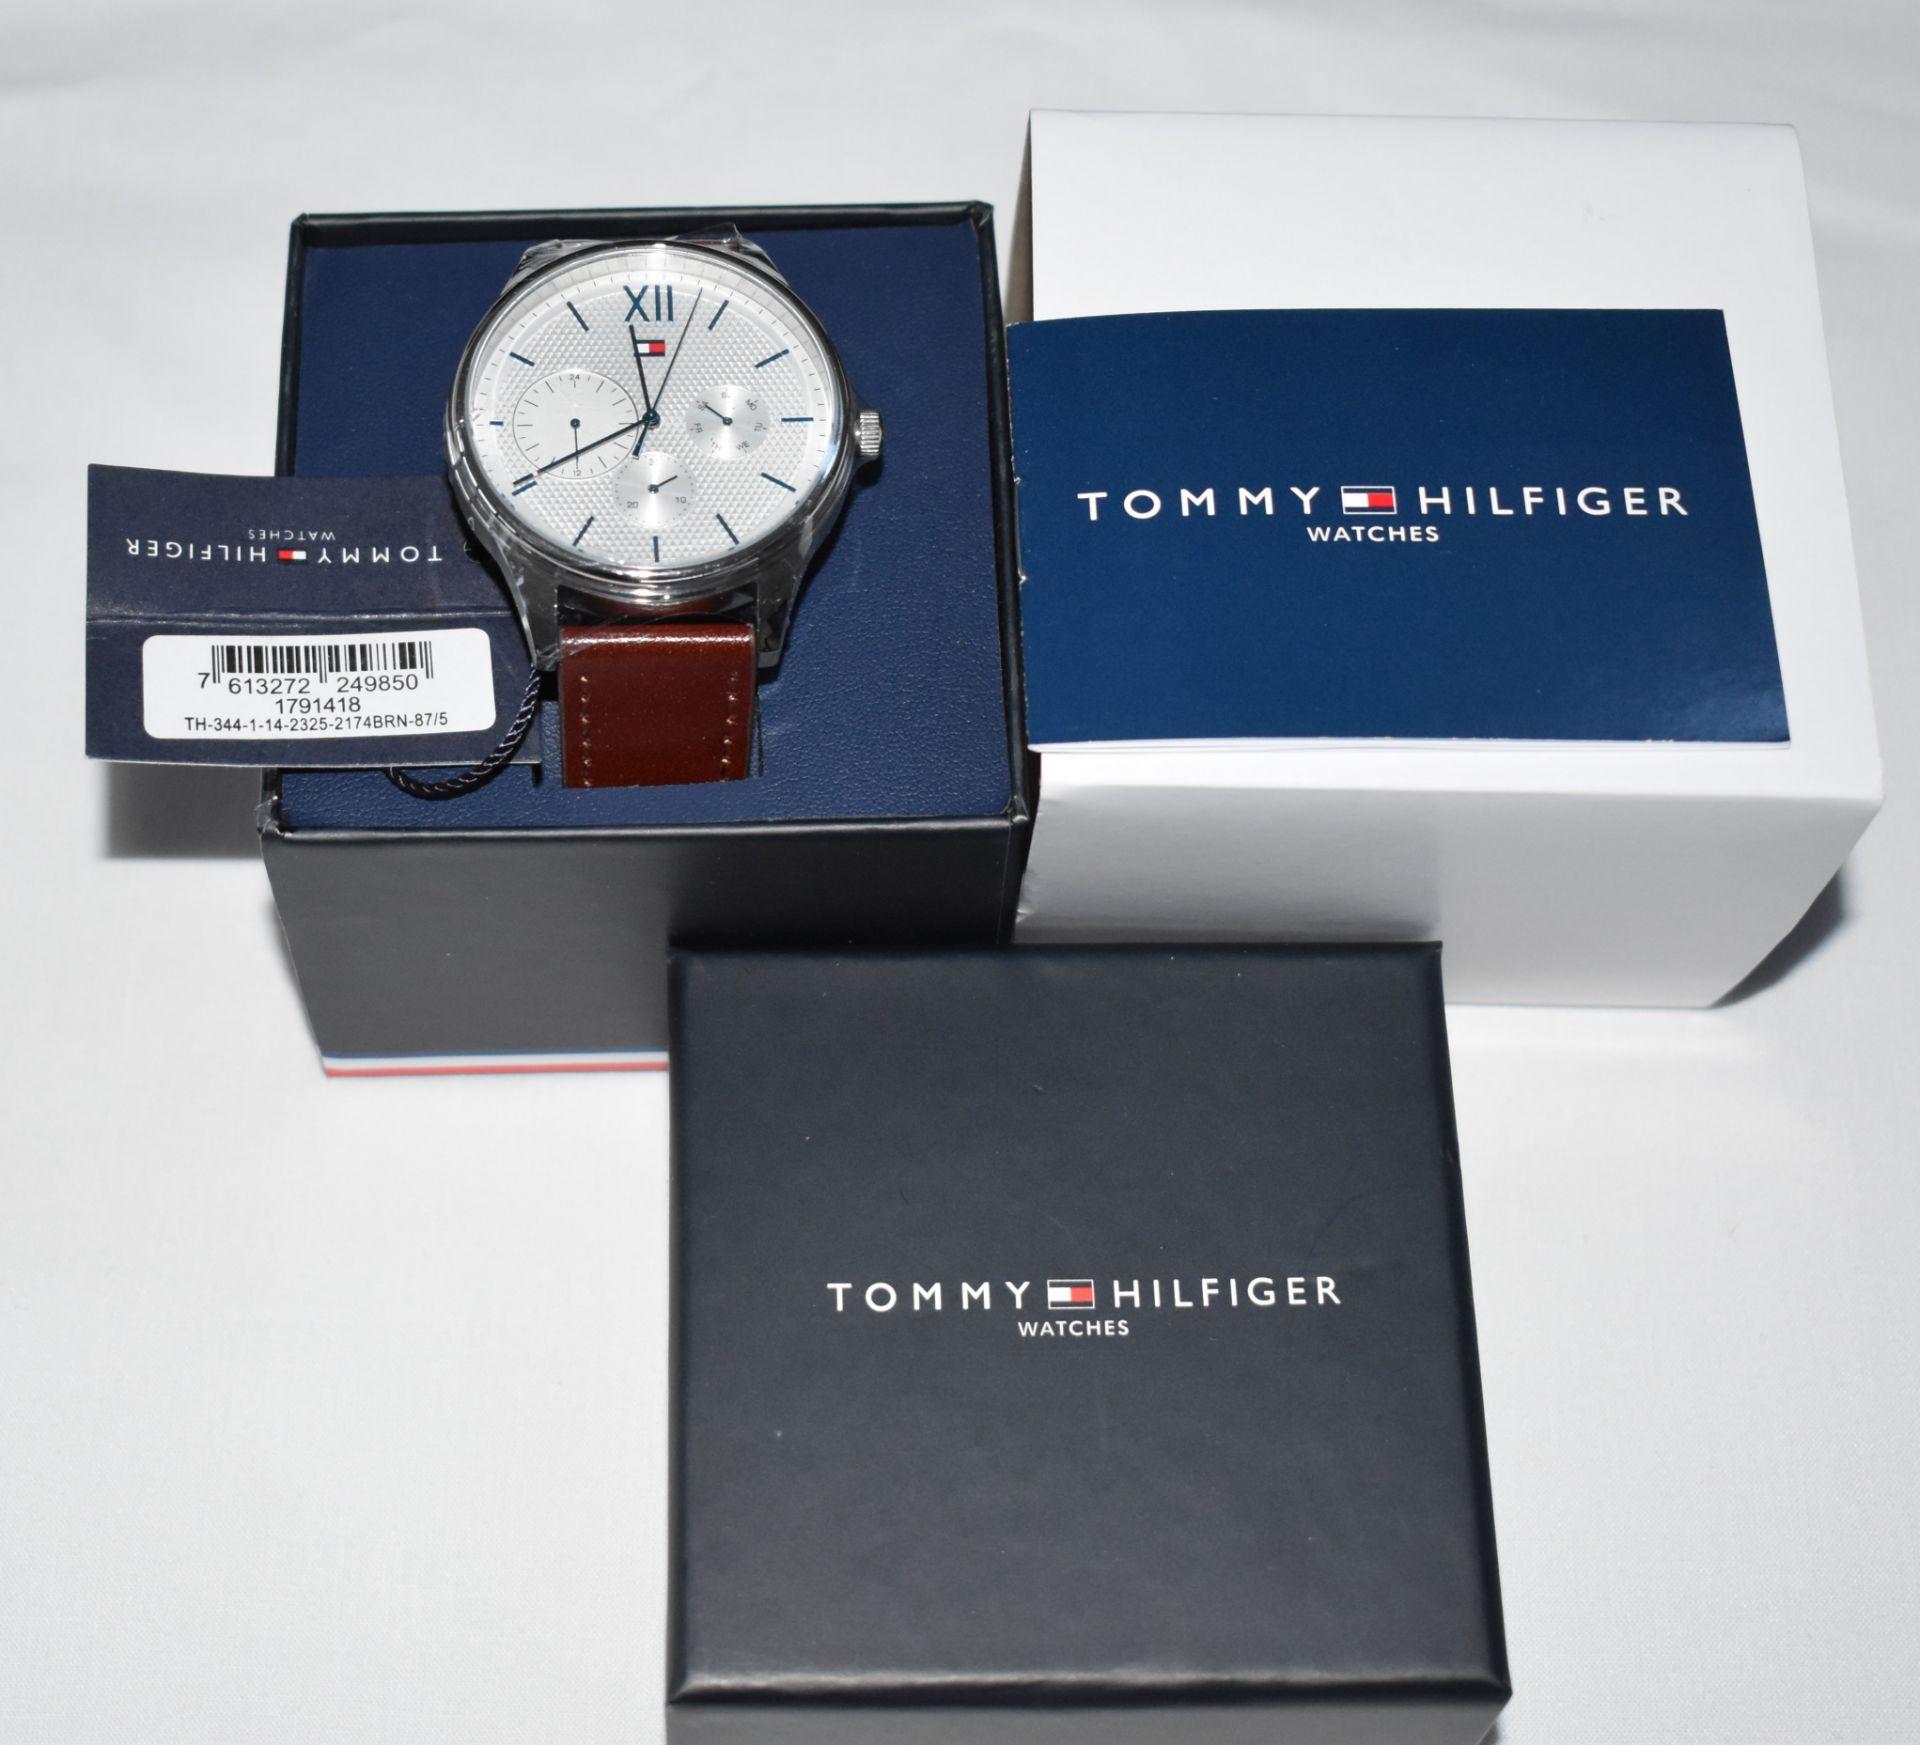 Tommy Hilfiger Men's Watch 1791418 - Image 2 of 2